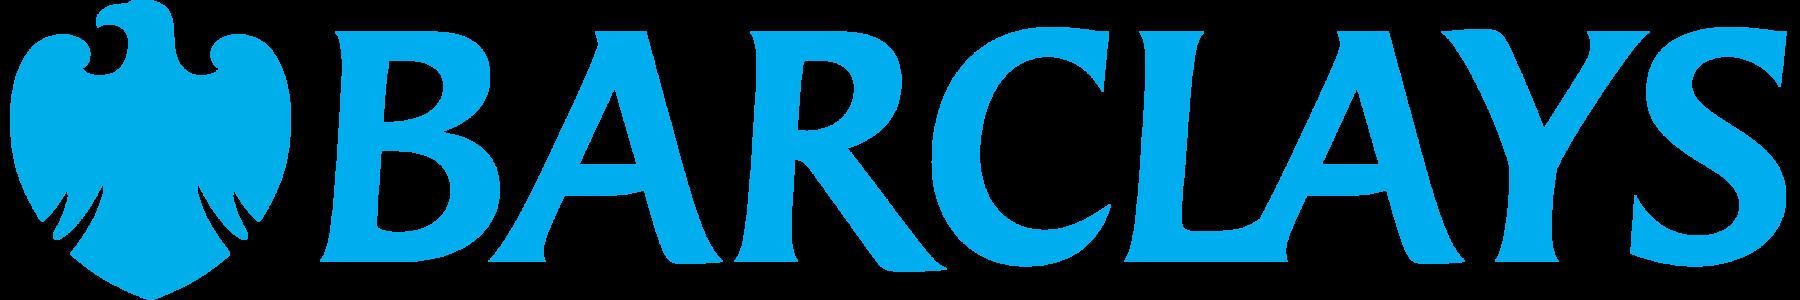 Barclays_logo_logotype